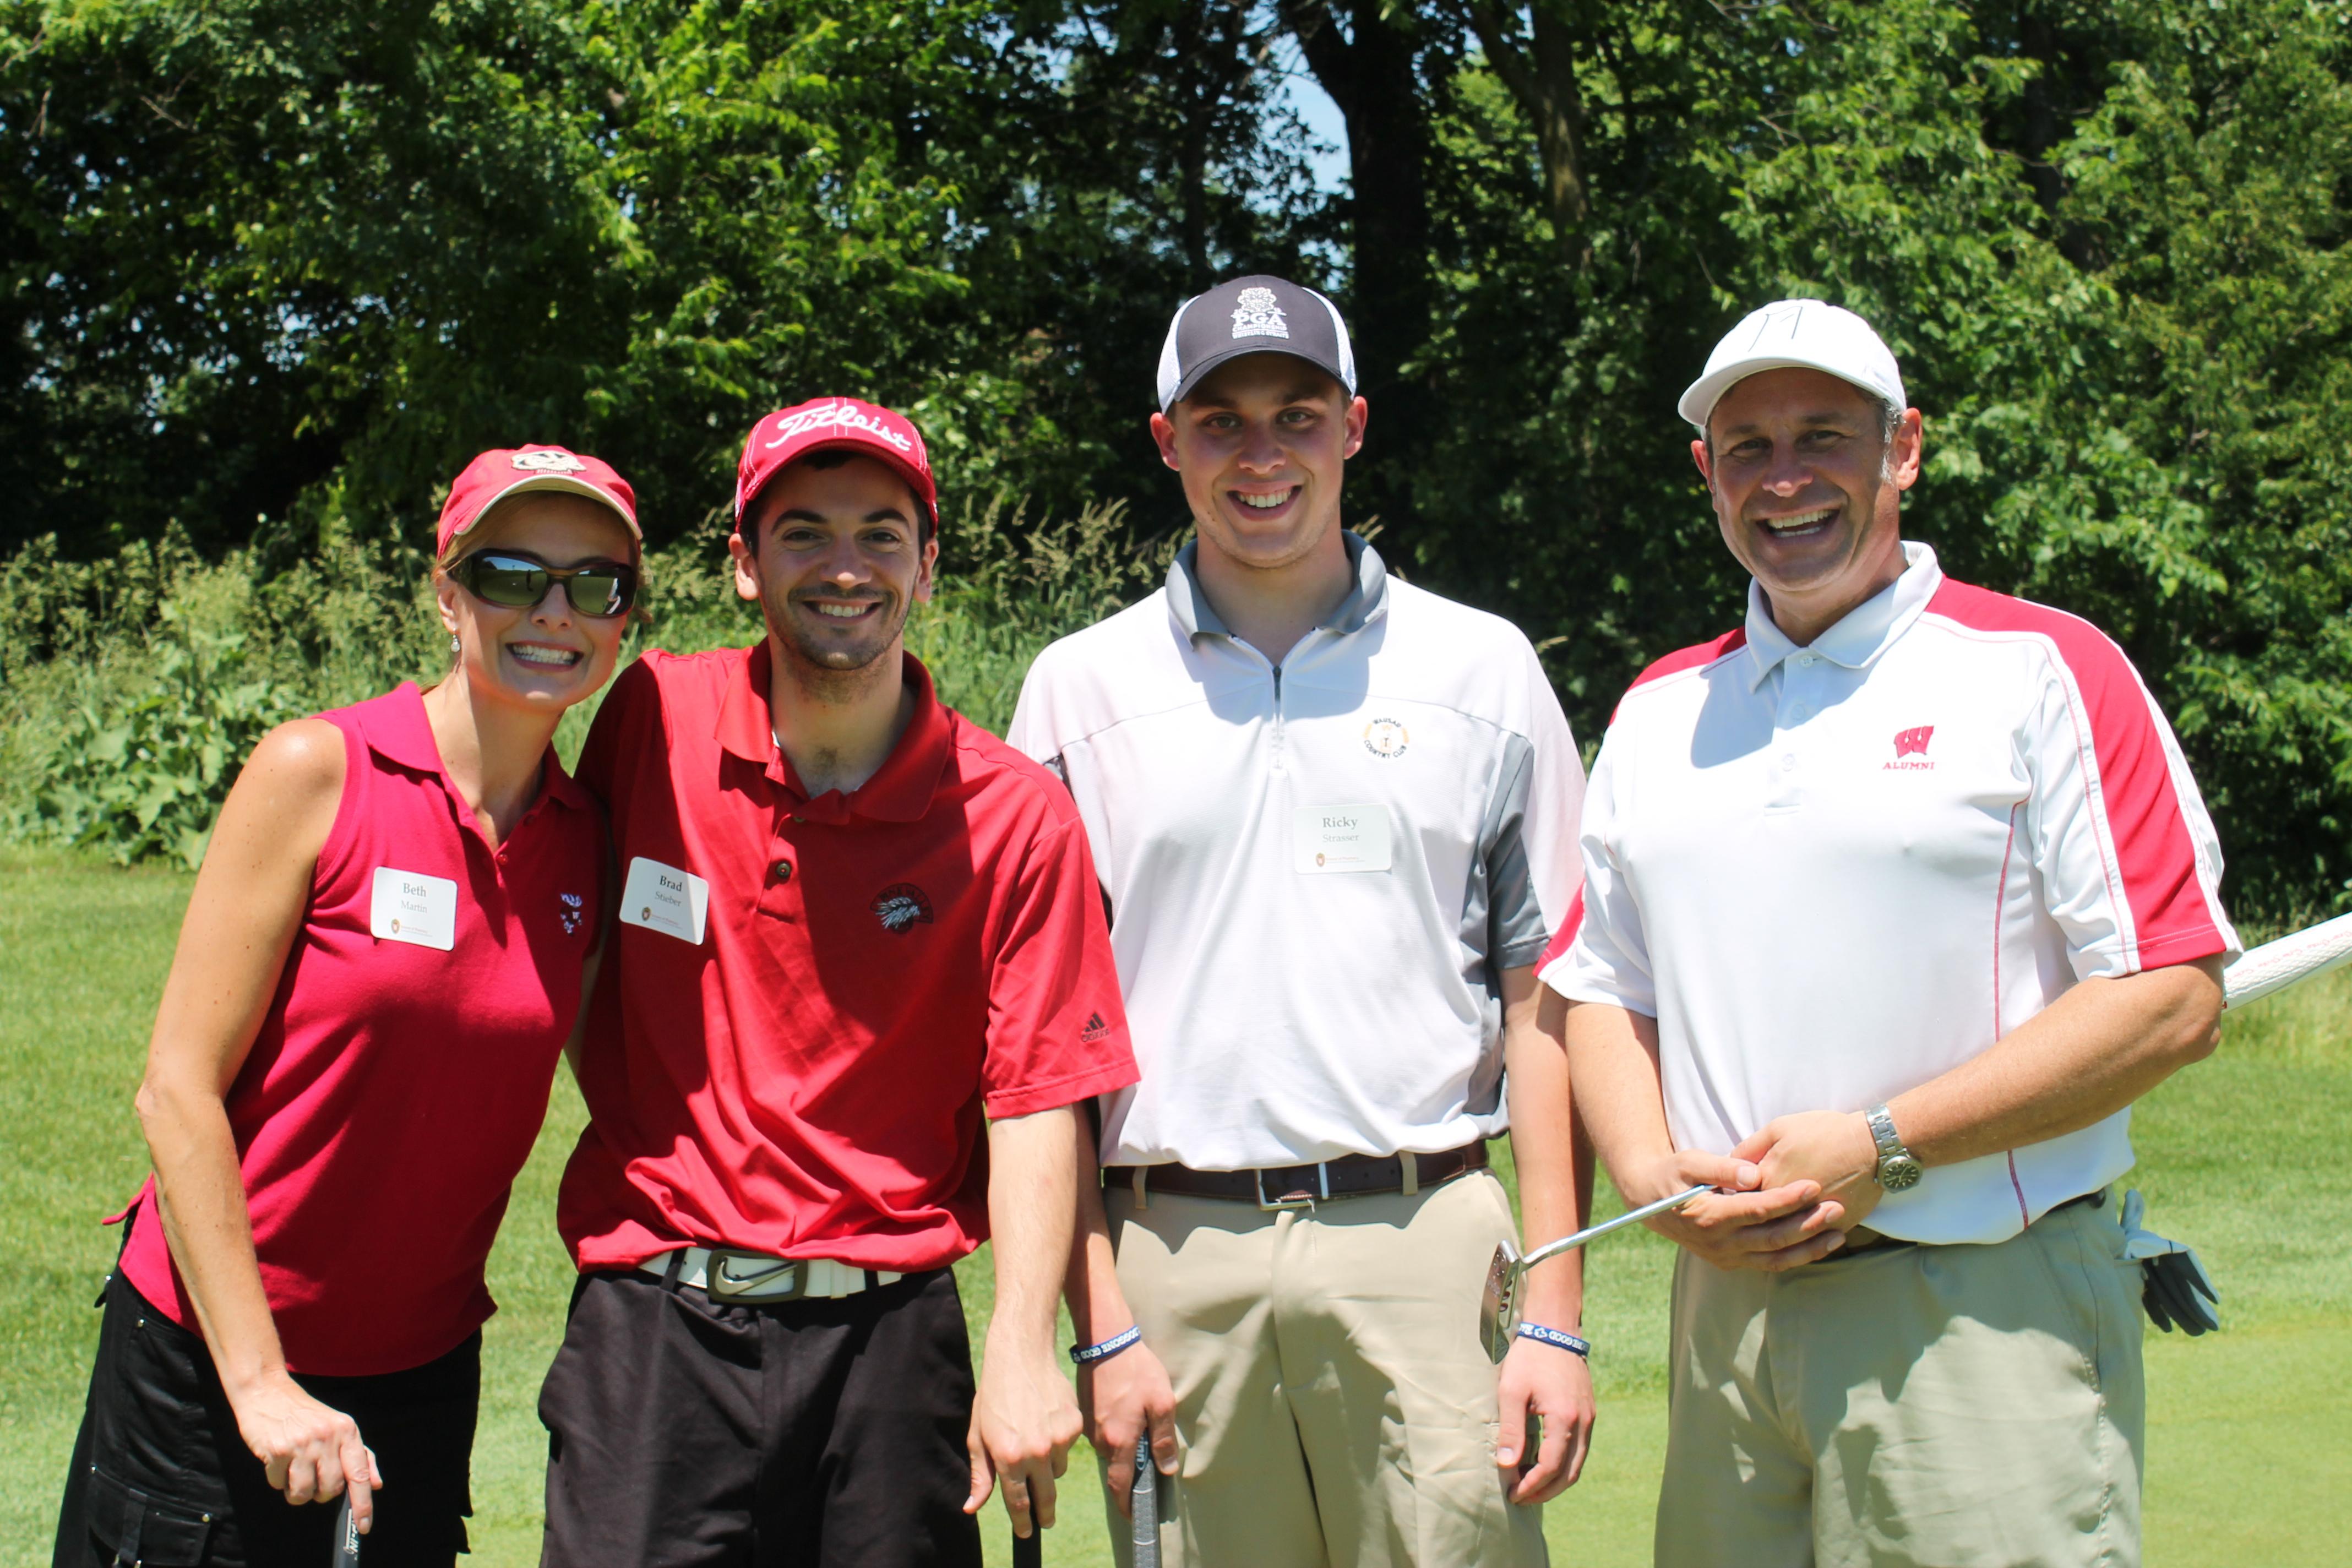 Beth Martin, Brad Steiber, Ricky Strasser at the Golf Outing